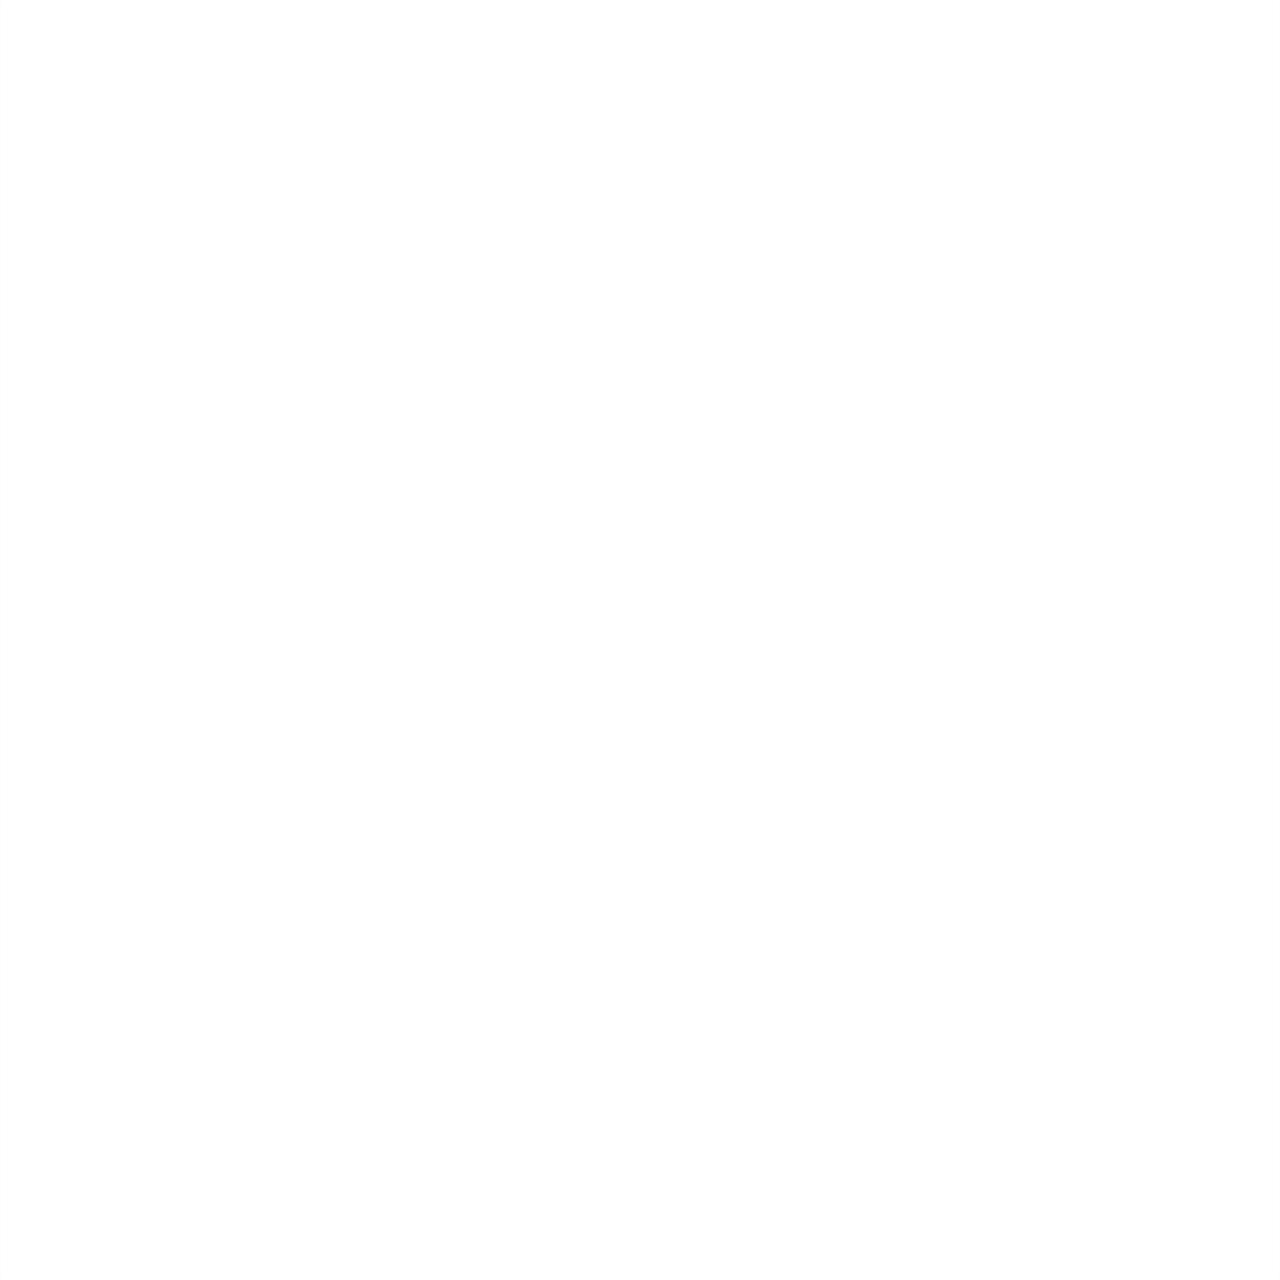 Алюкобонд белый 8807 (3мм/18мкм) 1,22мХ2,44м